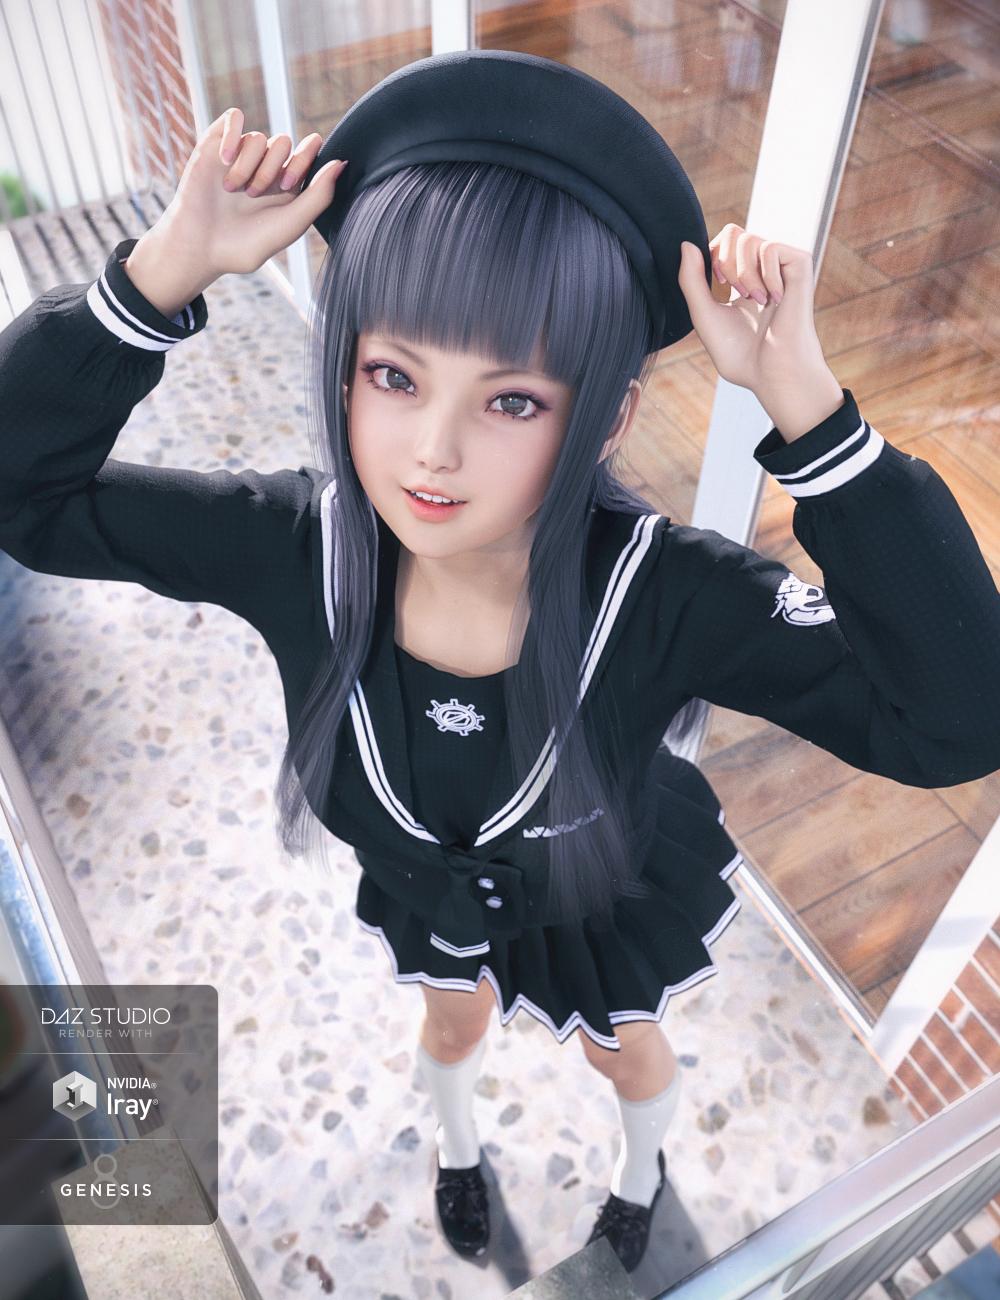 dForce JK Suit for Genesis 8 Female(s) by: Daz OriginalsCrocodile Liu, 3D Models by Daz 3D